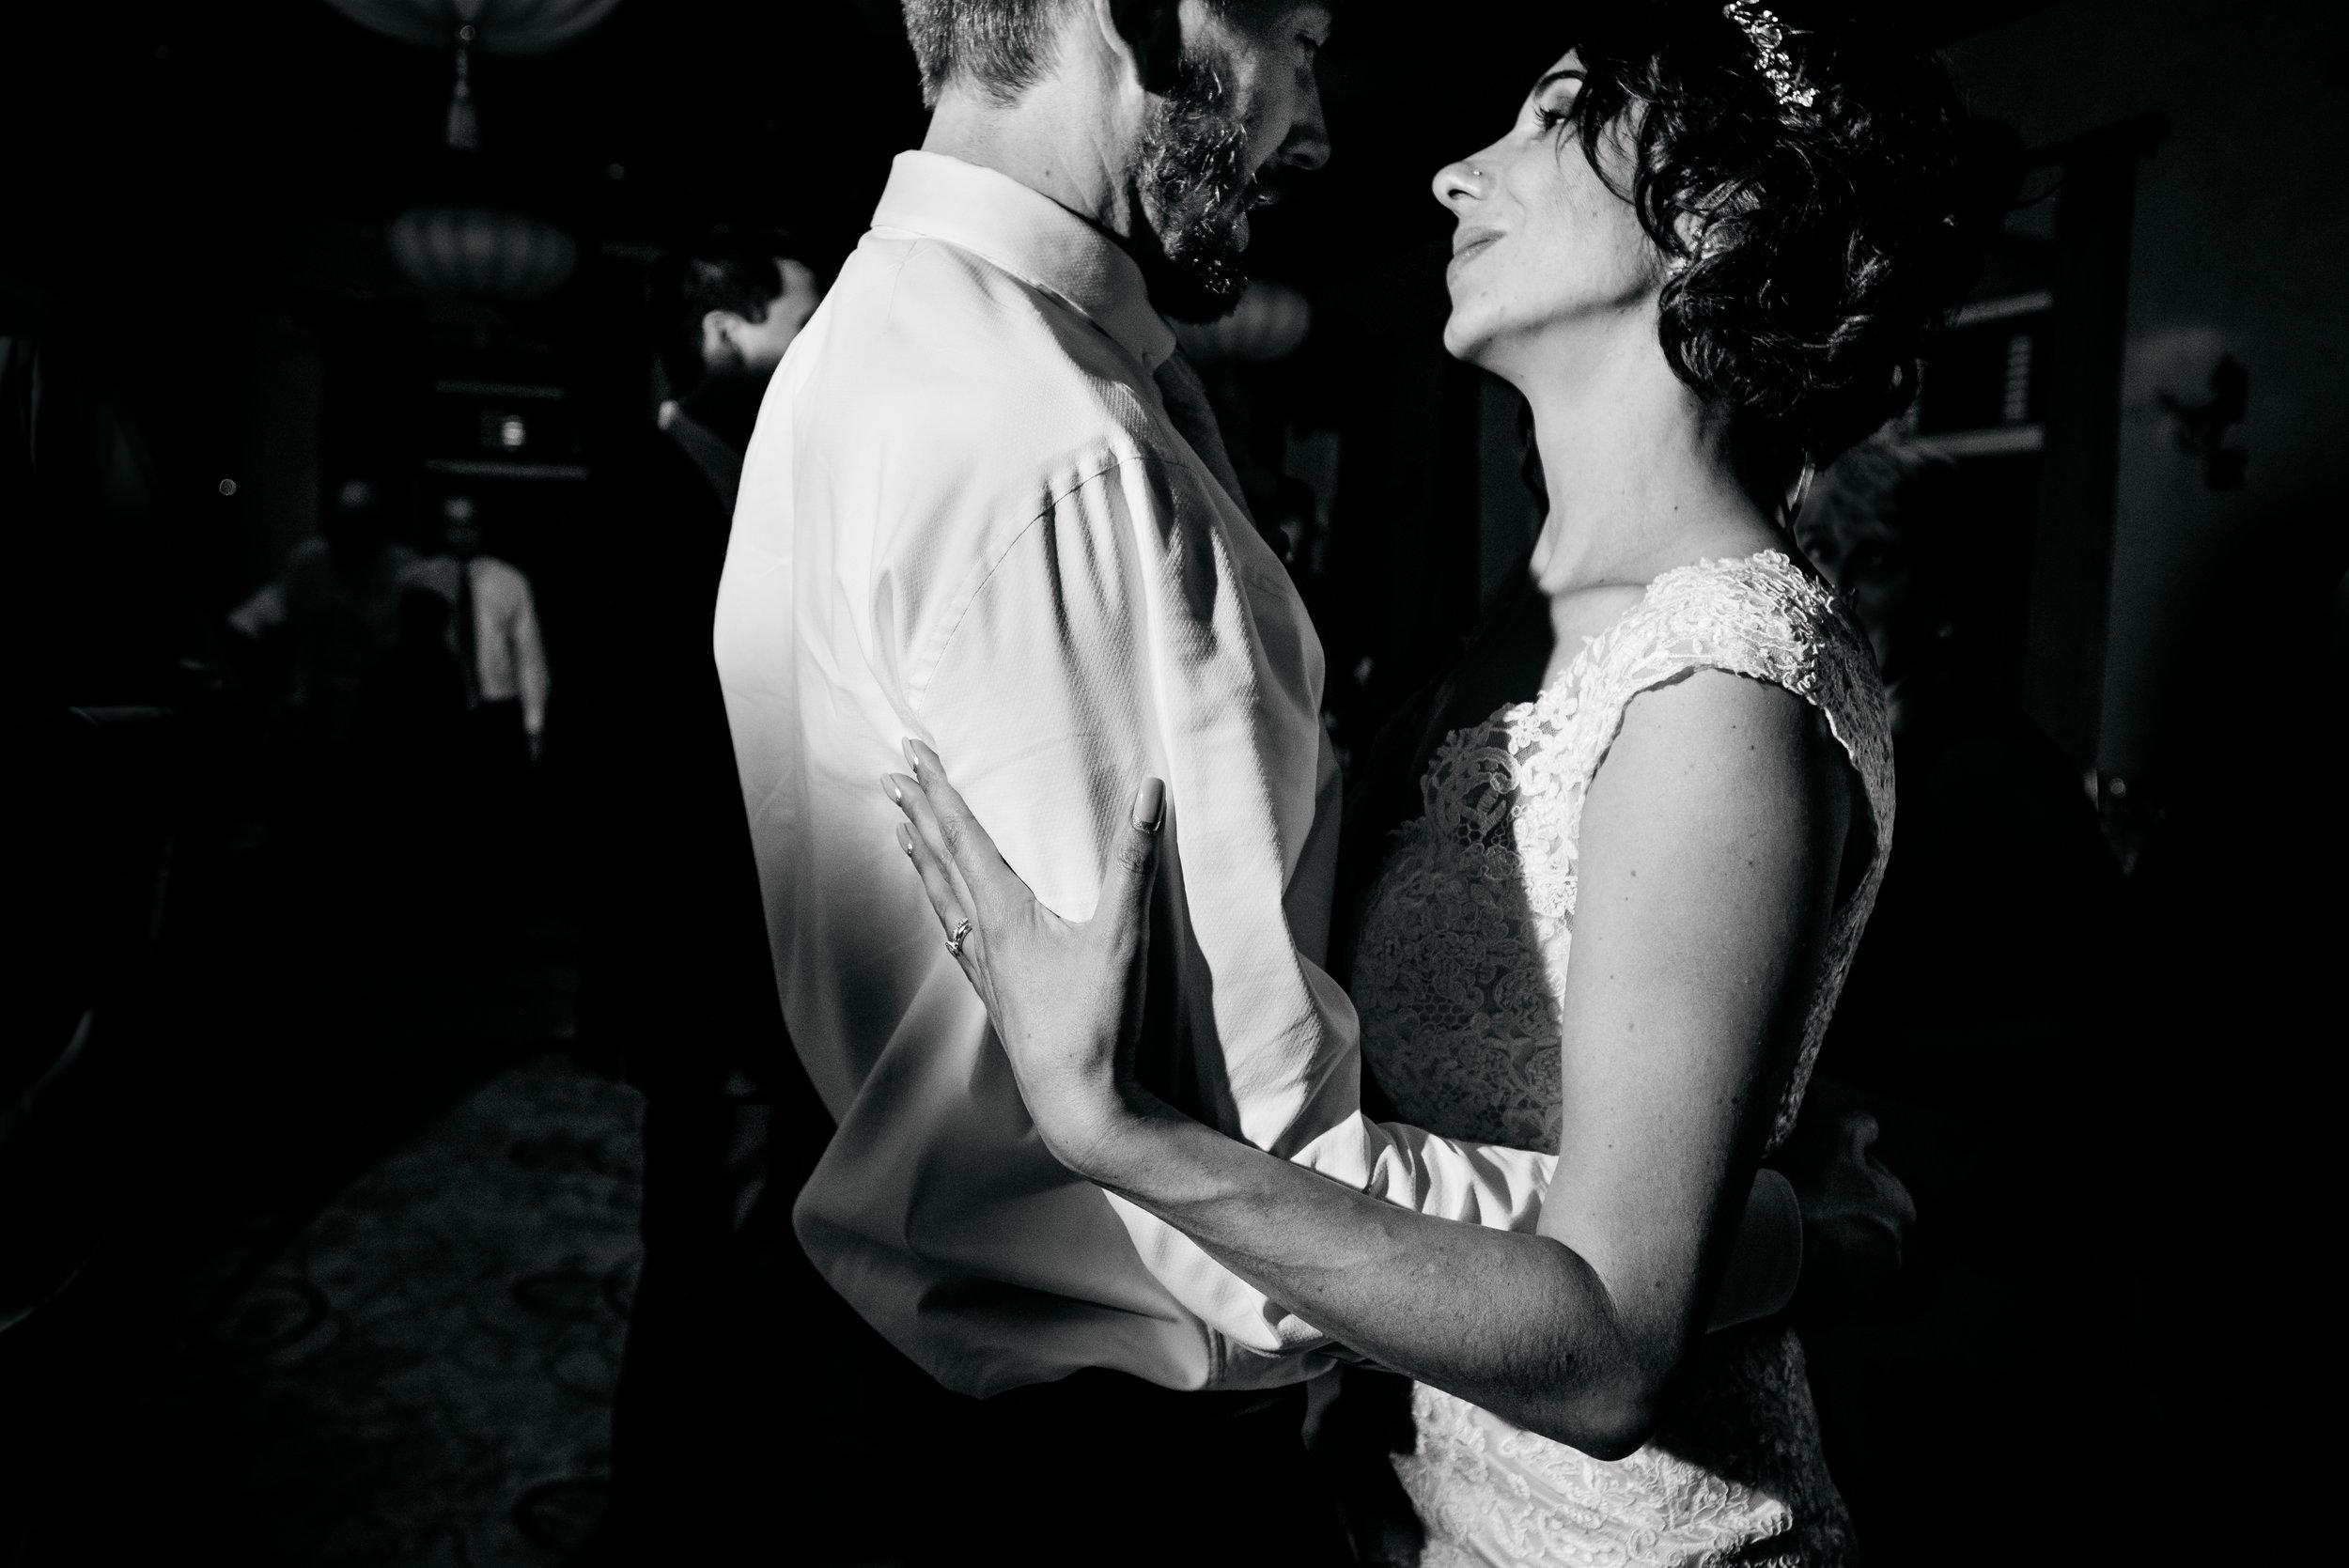 Extended_Play_Photography_Carmella_Wedding-30.jpg